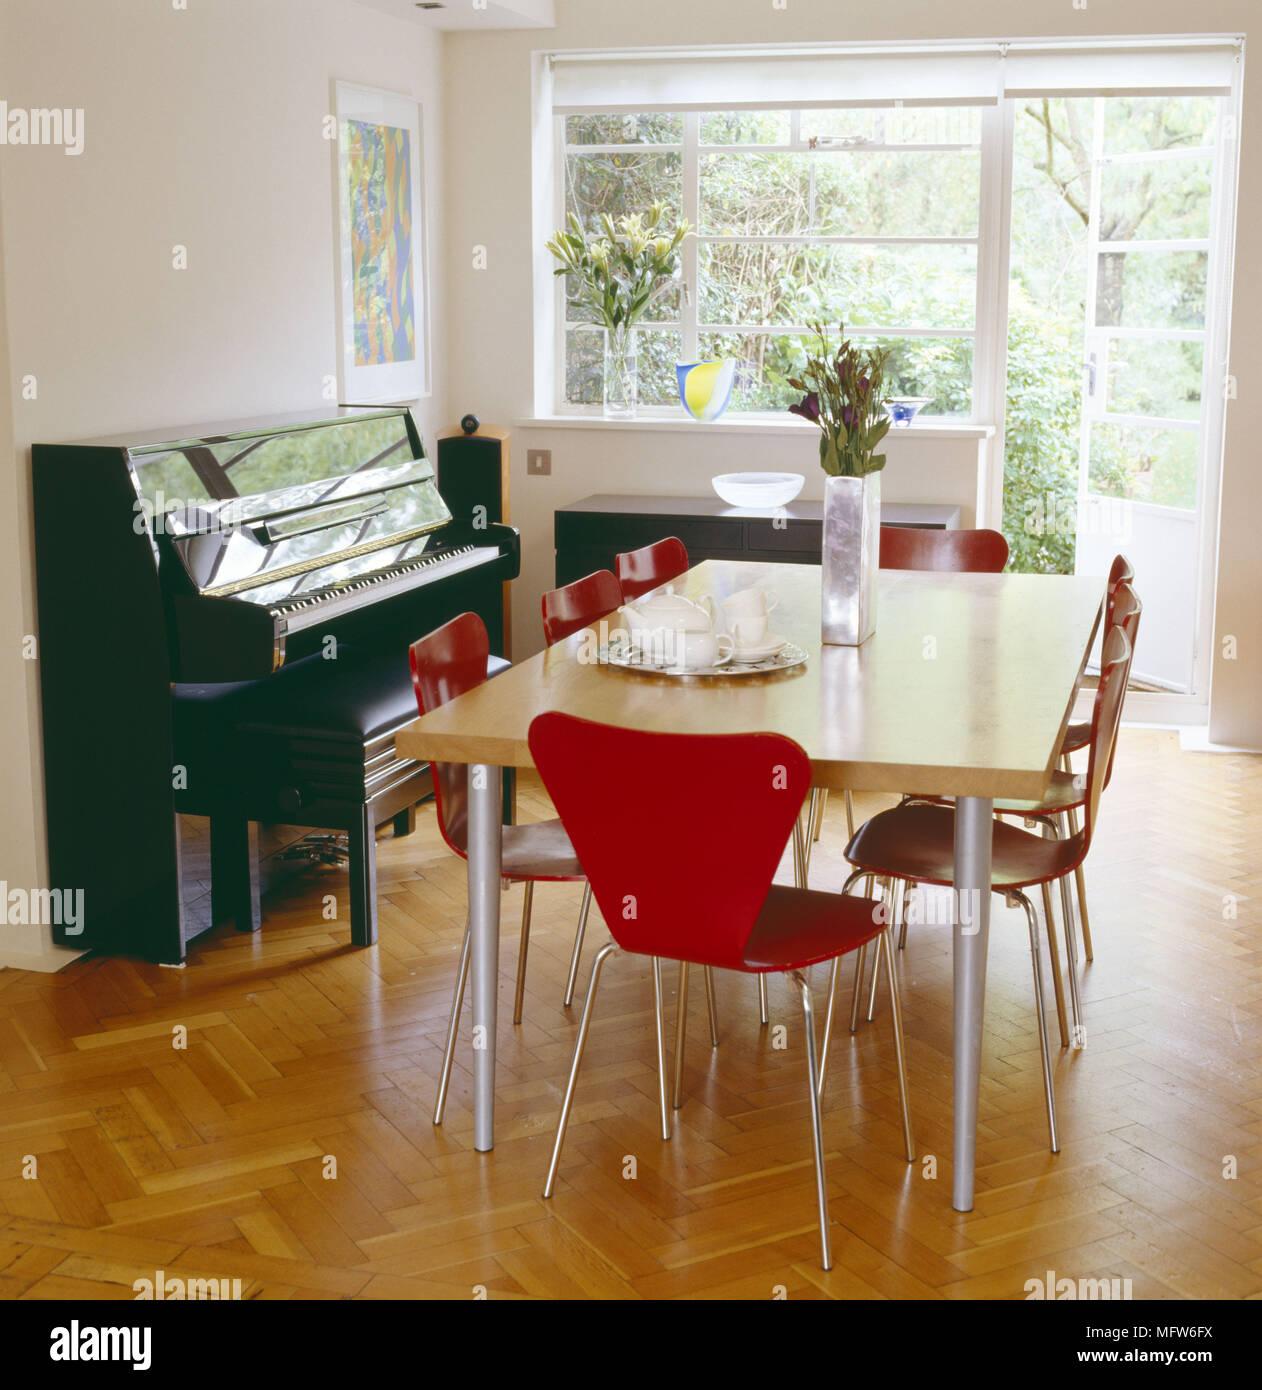 Une salle à manger moderne blanc rouge table bois Arne ...